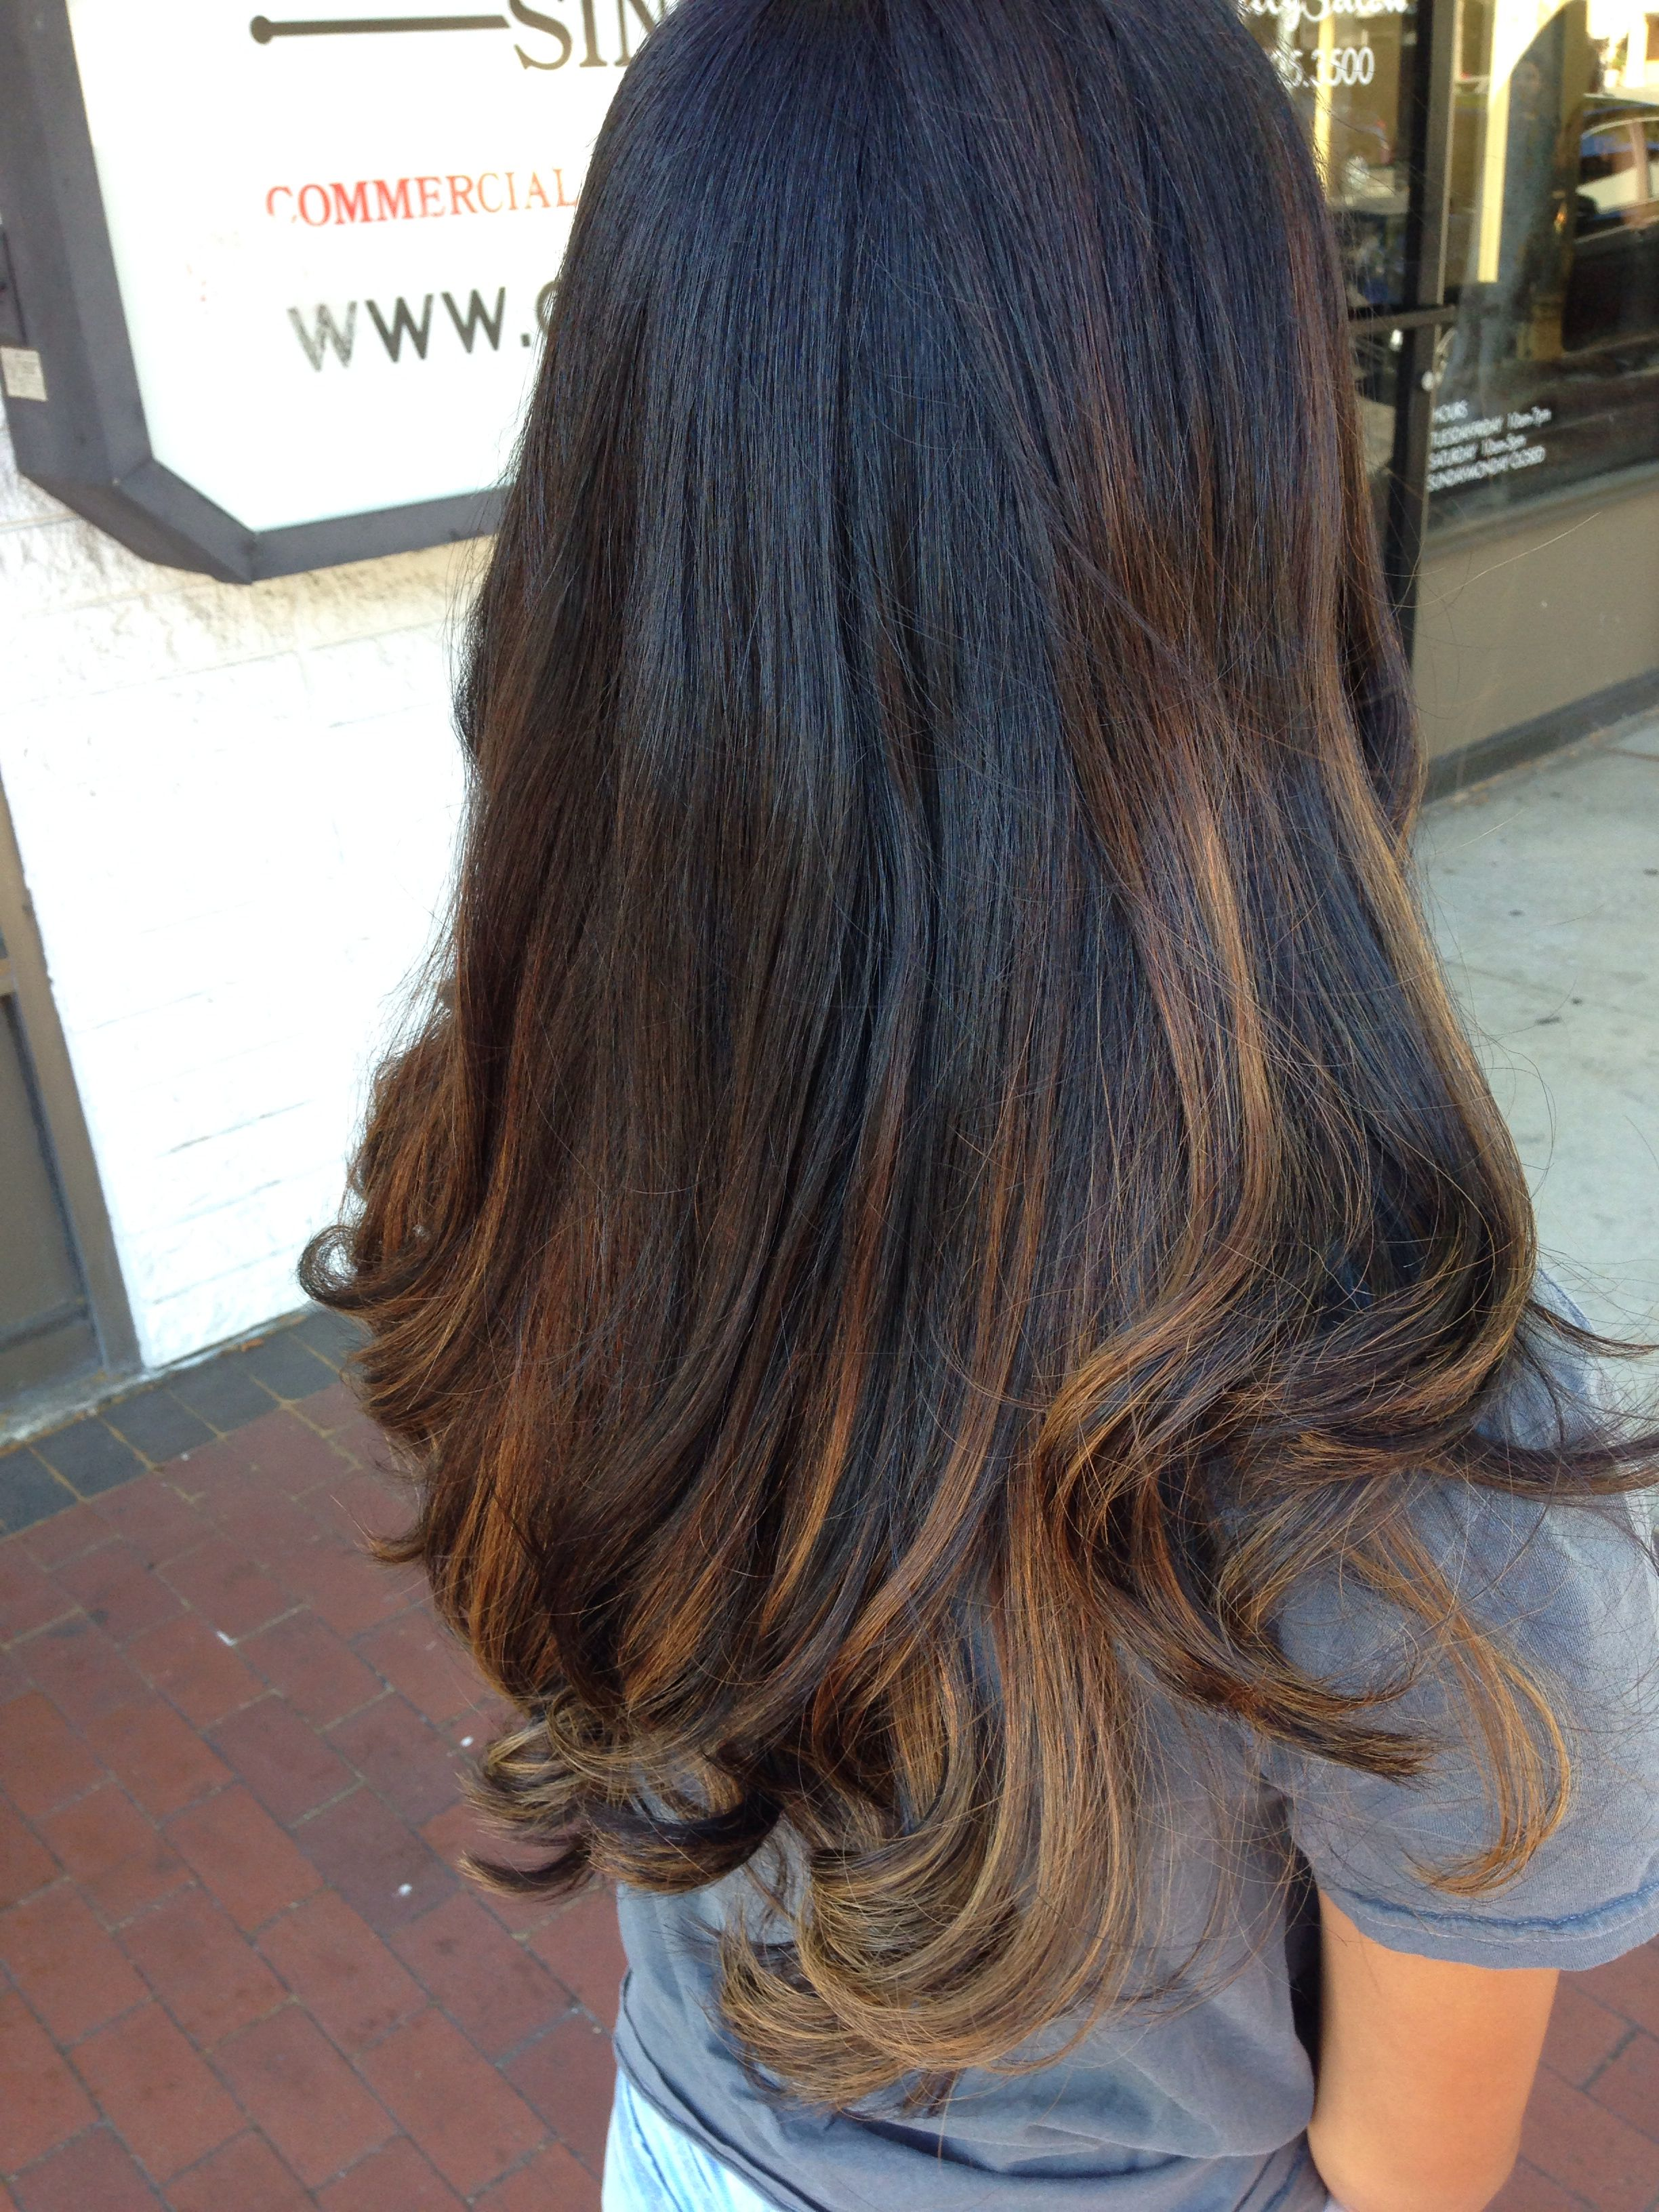 Baylage Highlights On Black Hair My Hair Done On 7 19 14 Hair Styles Hair Black Hair With Highlights